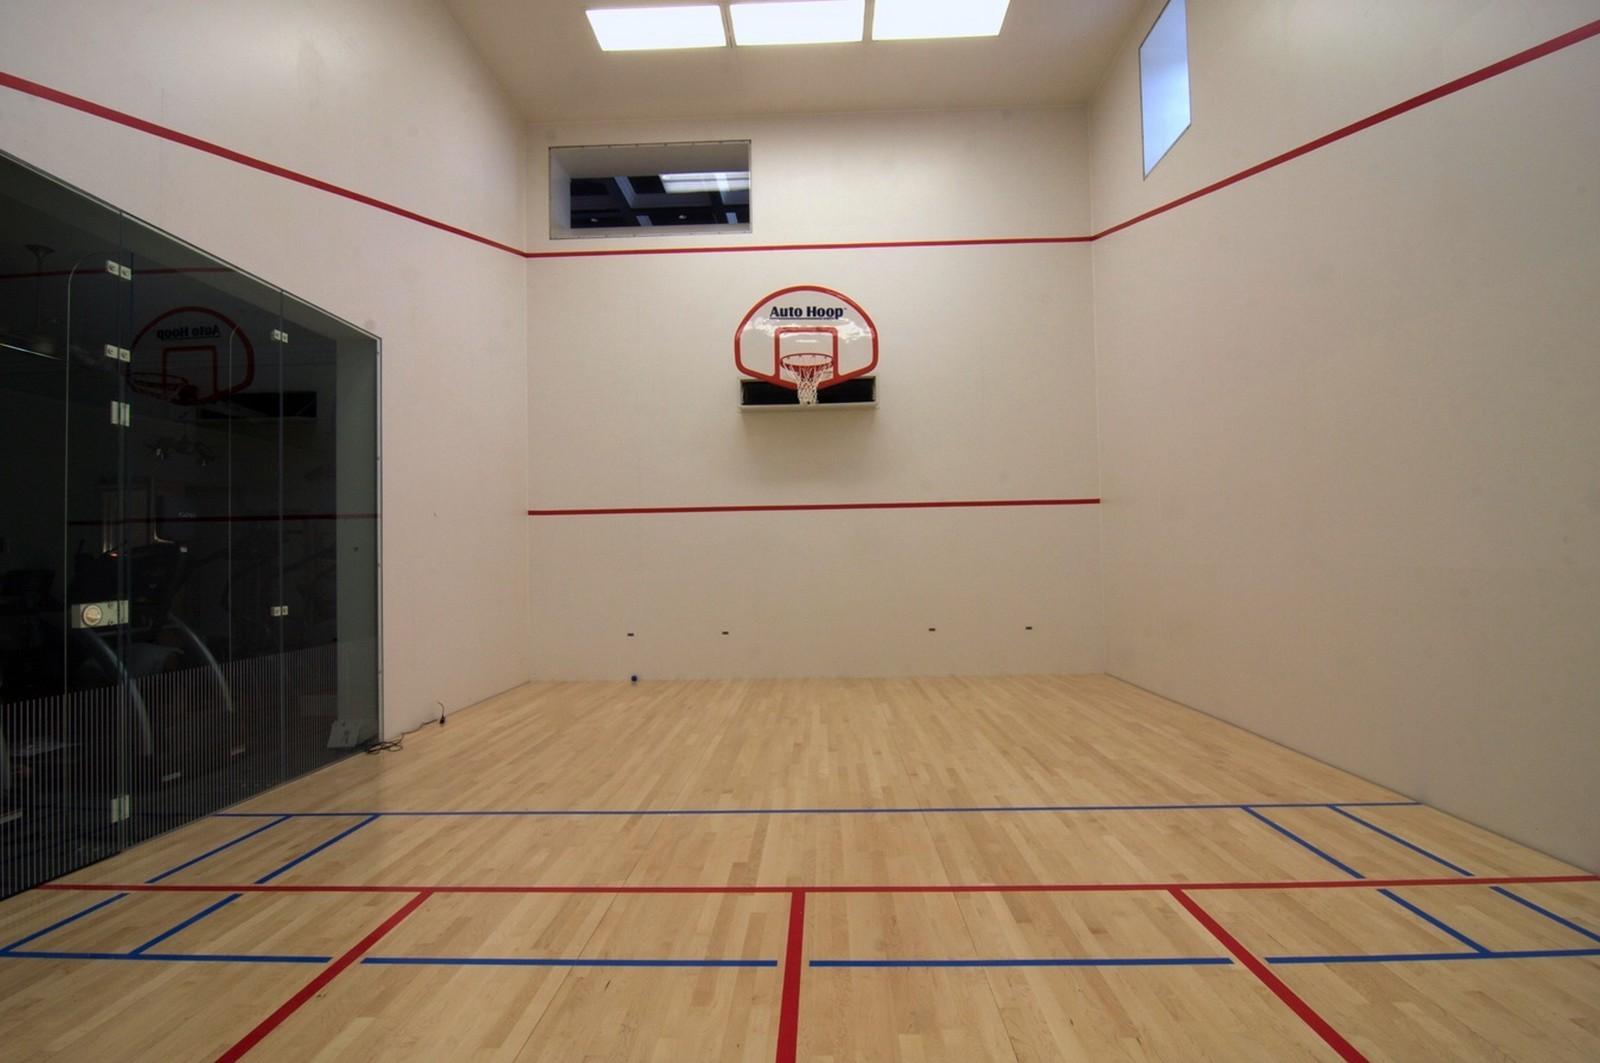 Real Estate Photography - 612 halsey lane, bridgehampton, NY, 11932 - Basketball Court